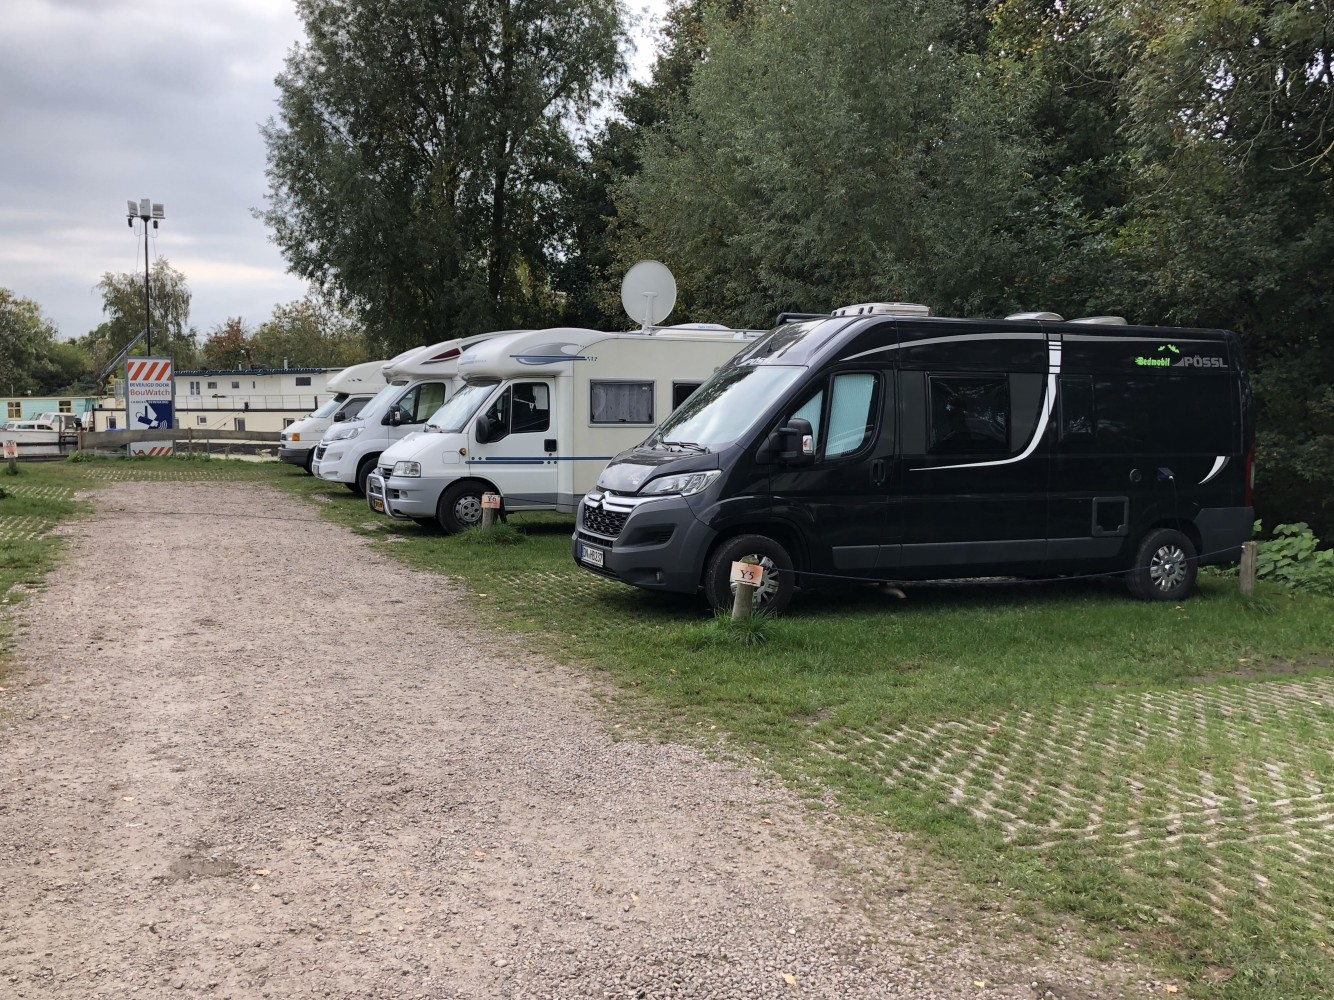 Kamp v Amsterdamu